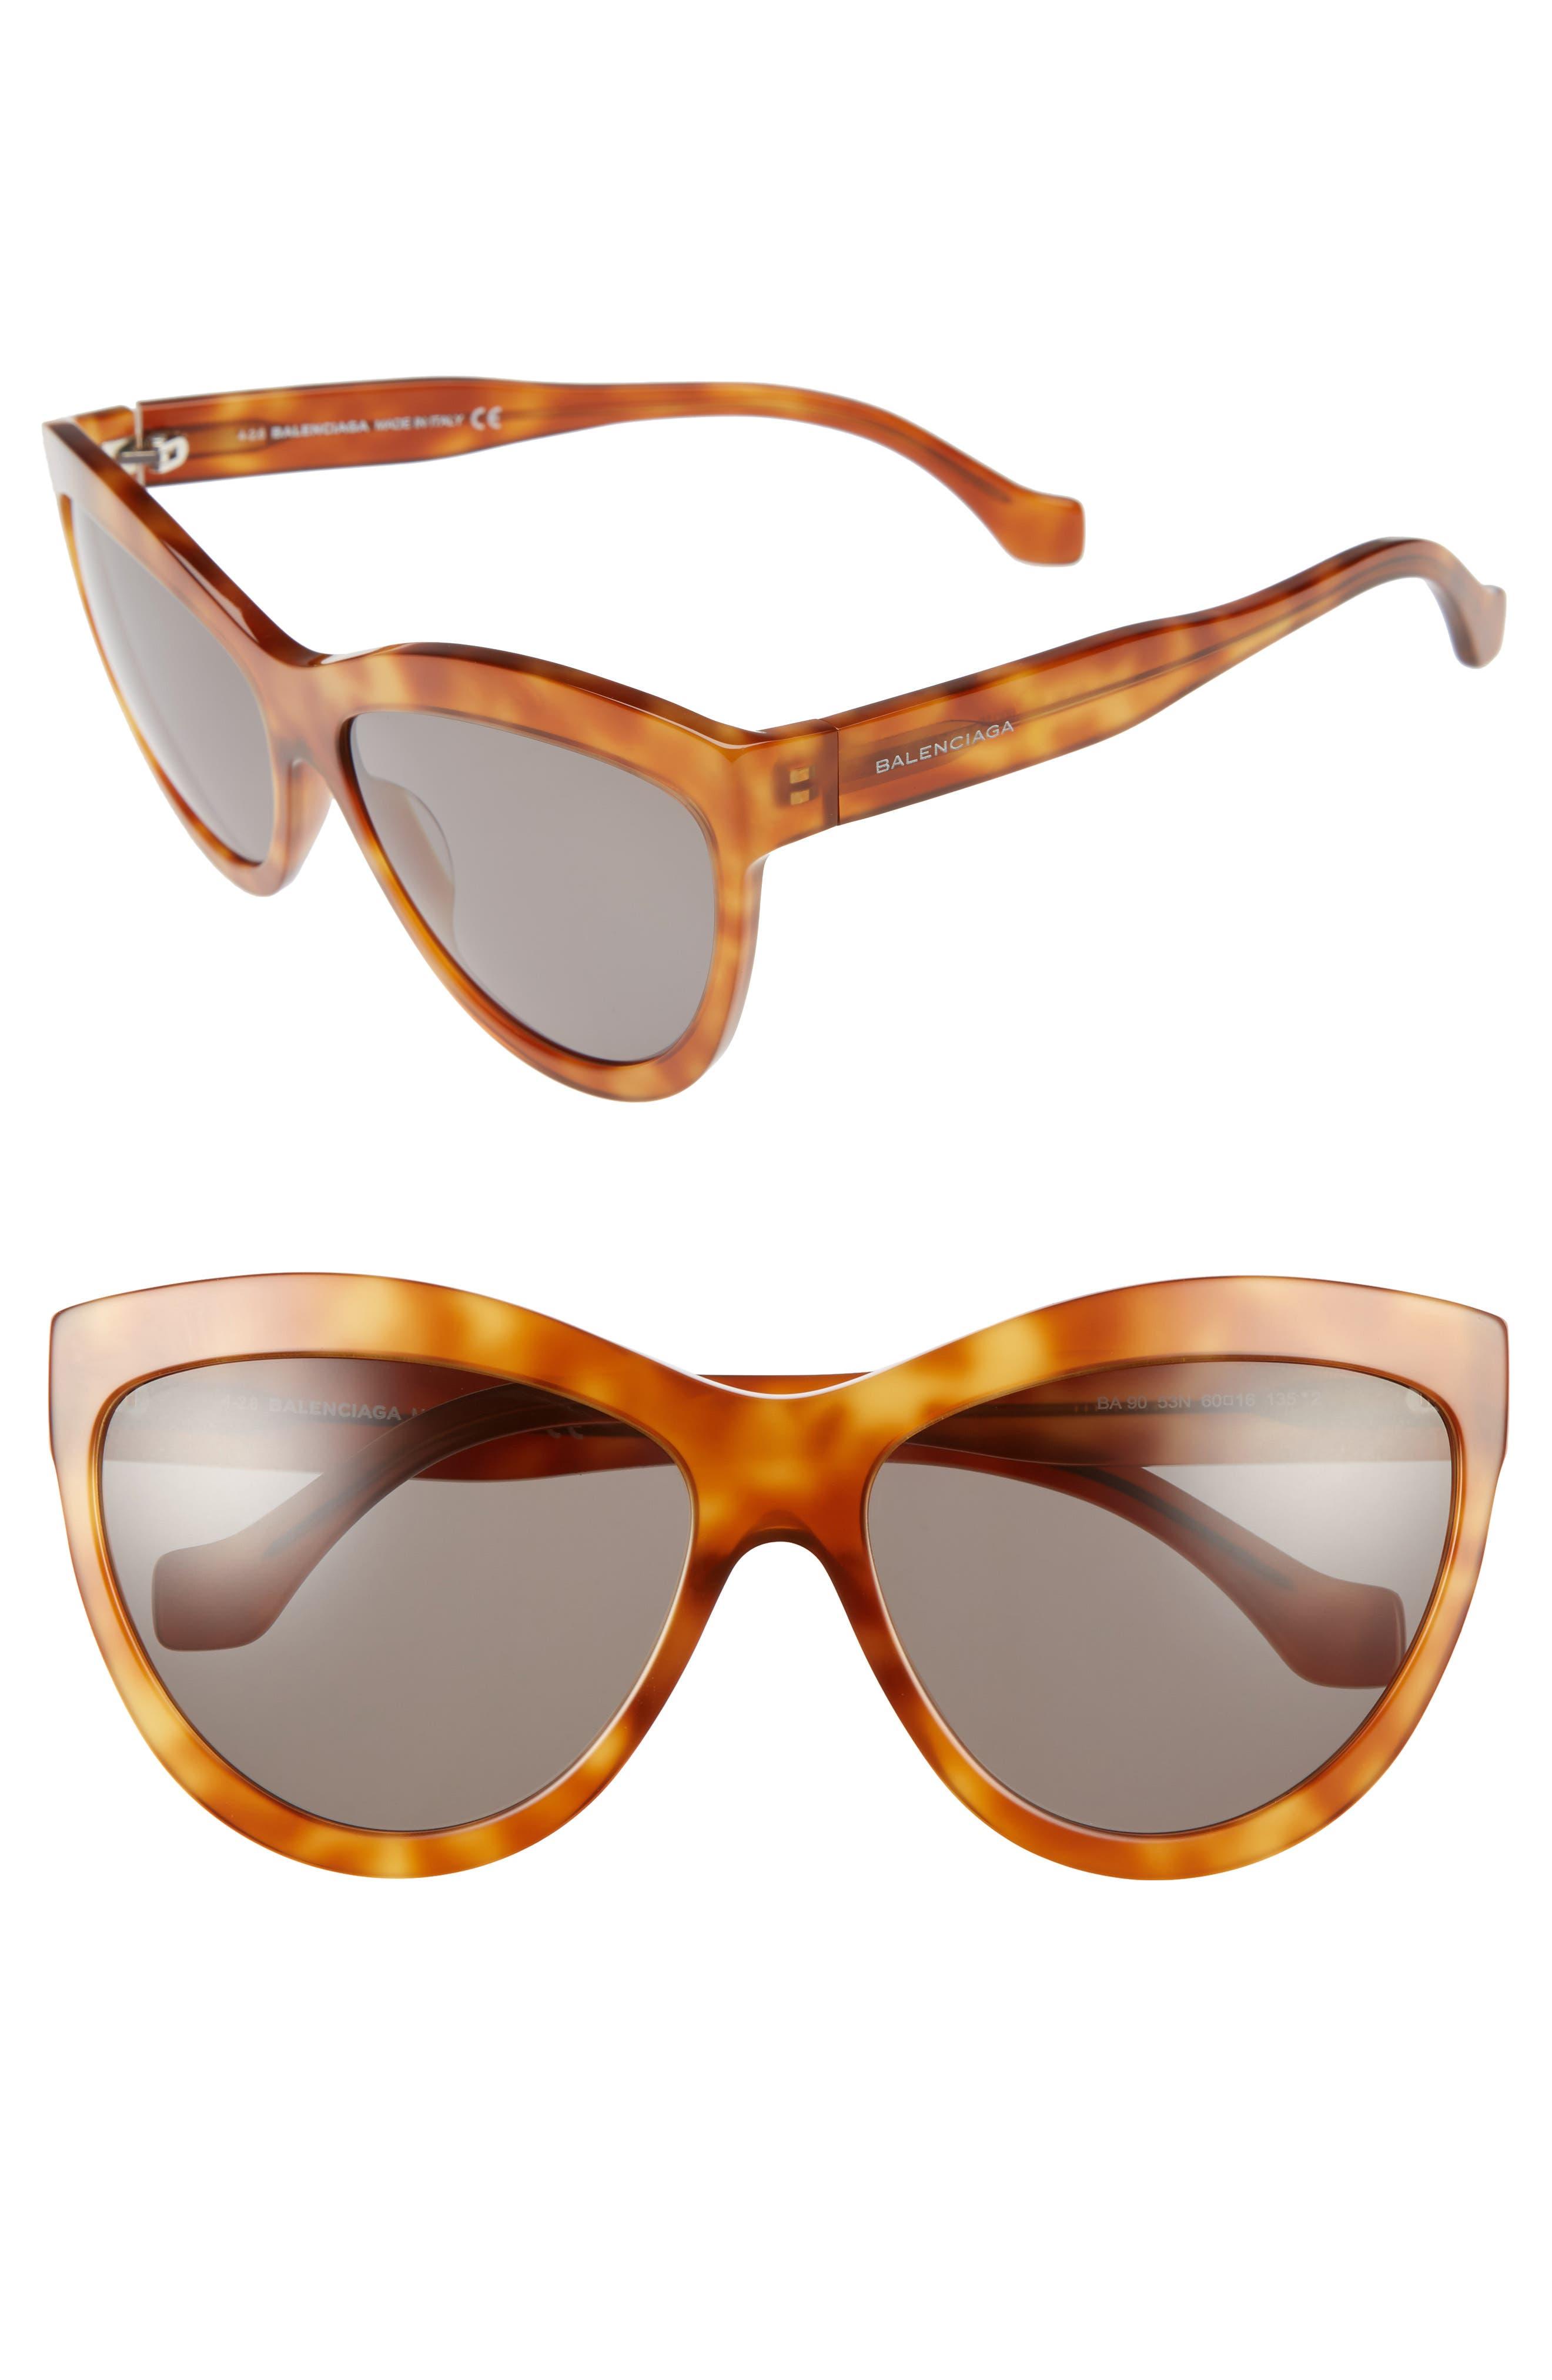 60mm Sunglasses,                             Main thumbnail 1, color,                             LIGHT HAVANA/ SILVER/ GREEN